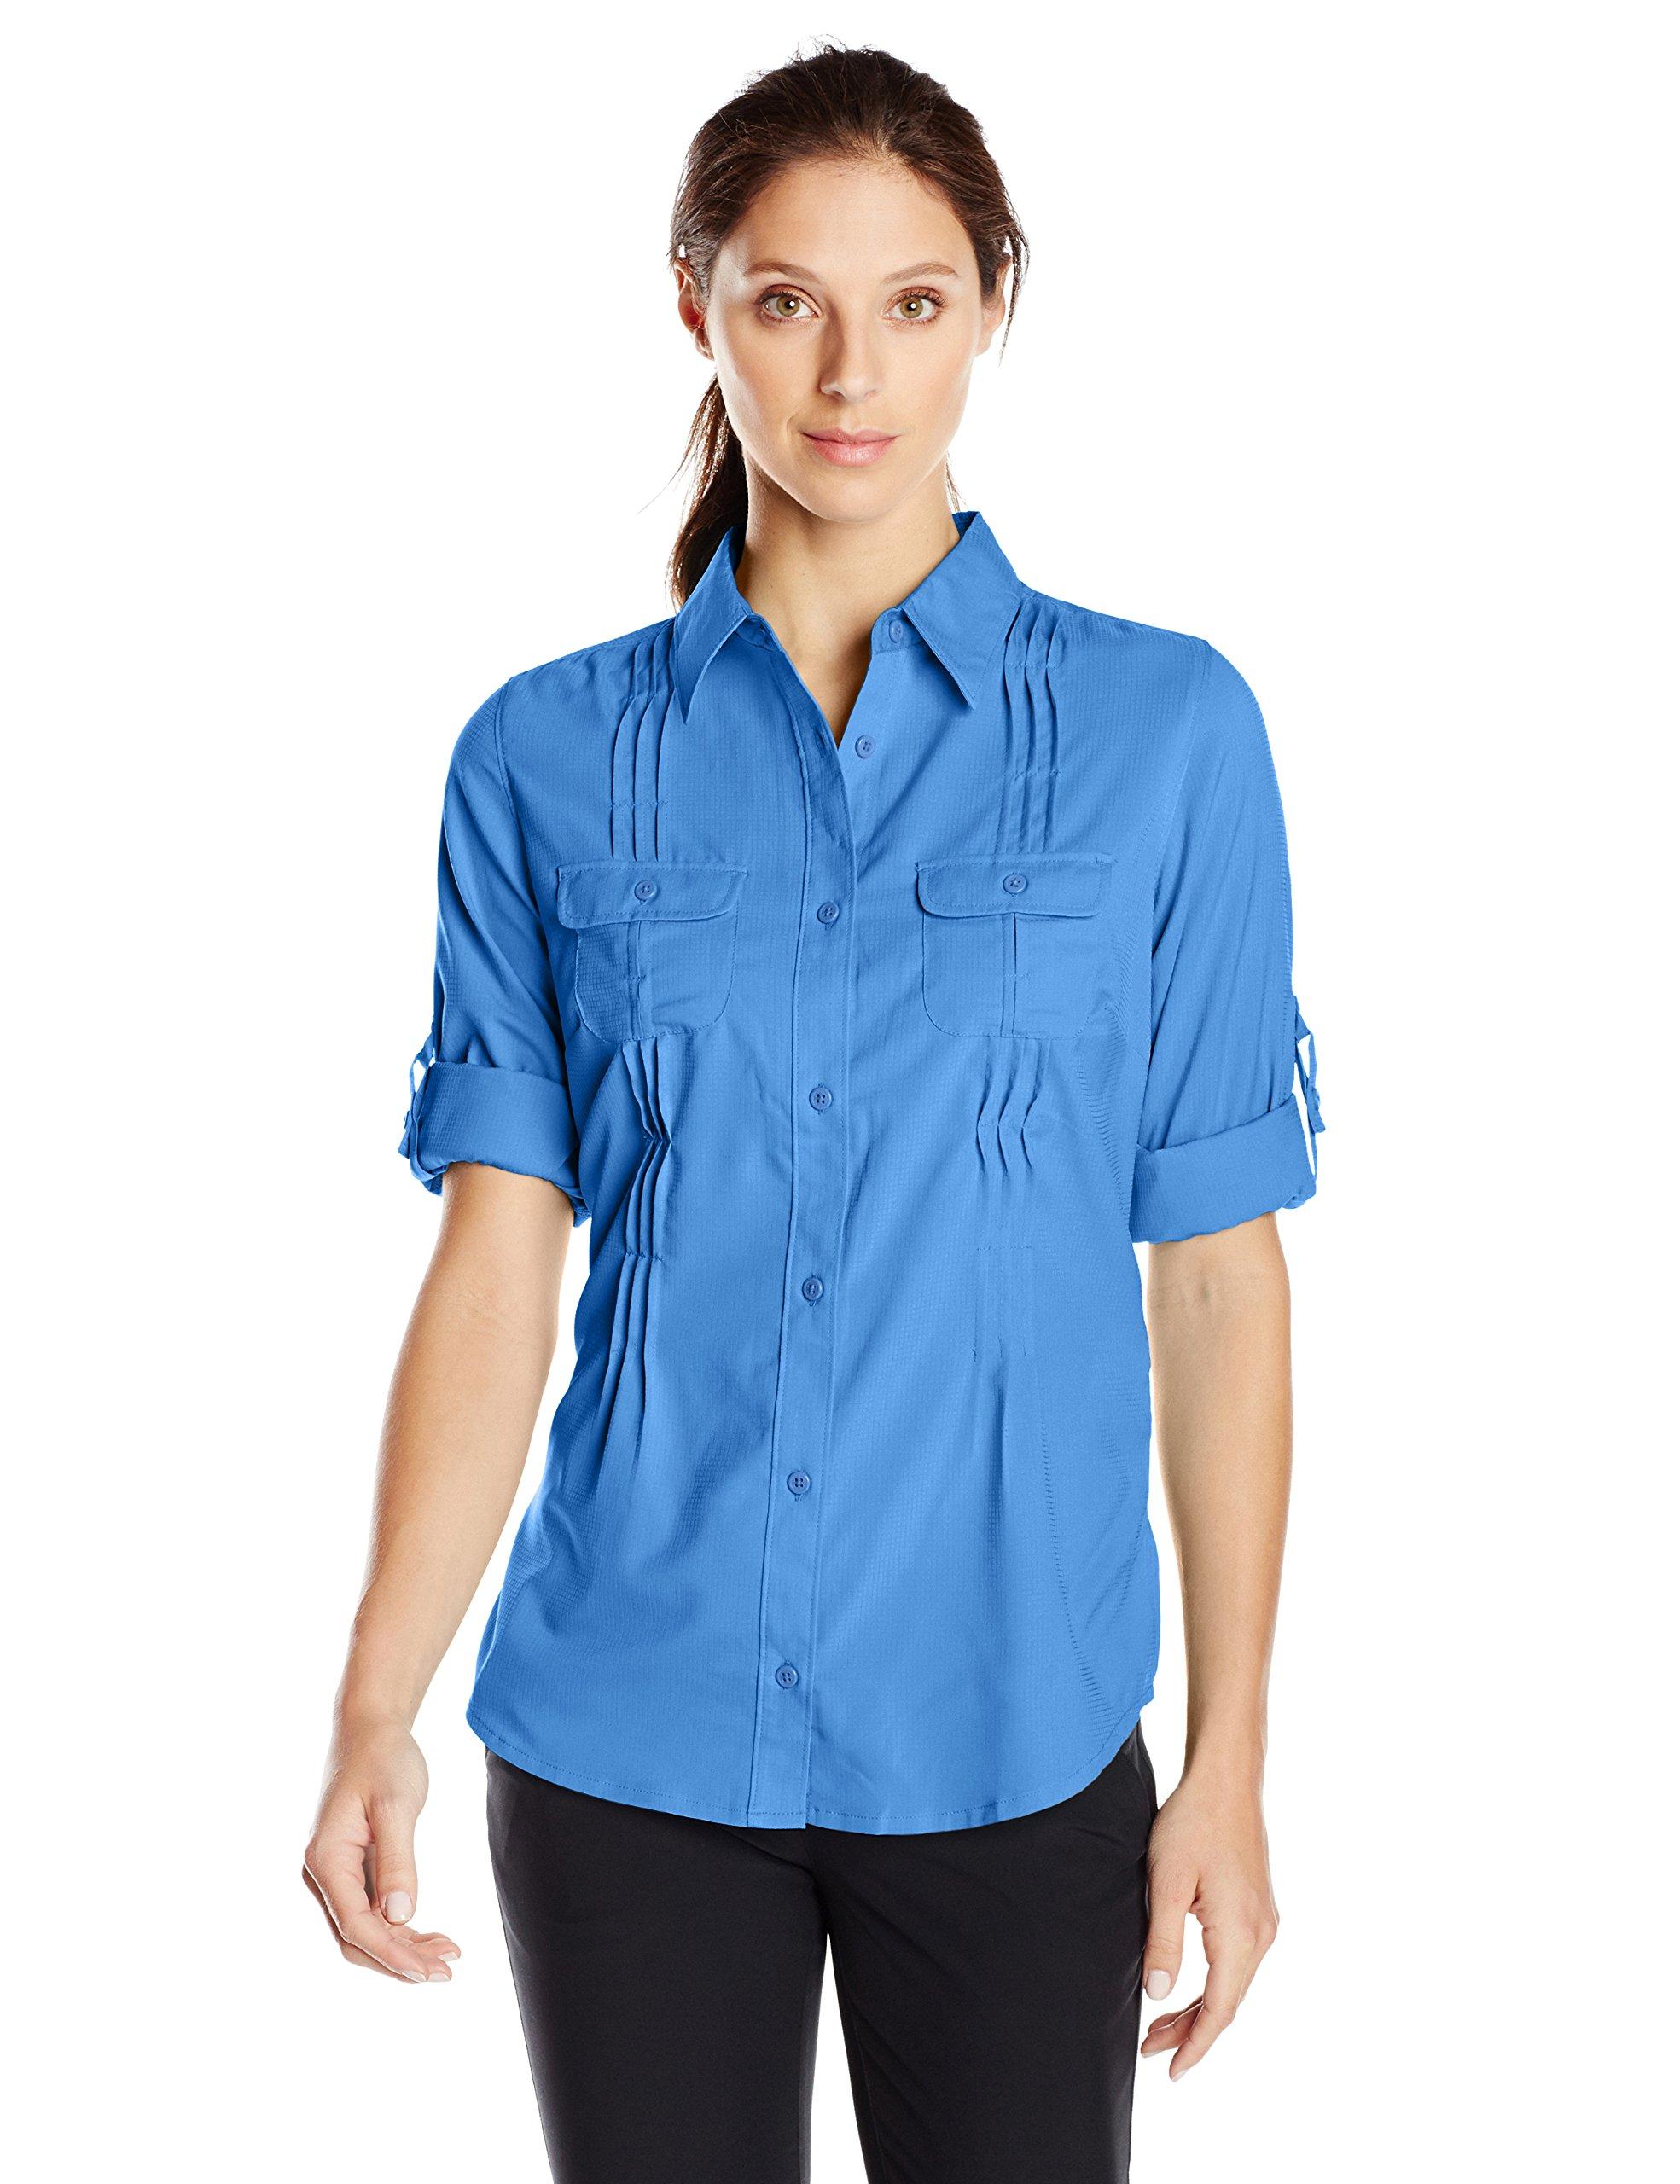 Columbia Women's Sun Goddess II Long Sleeve Shirt, Harbor Blue, X-Small by Columbia